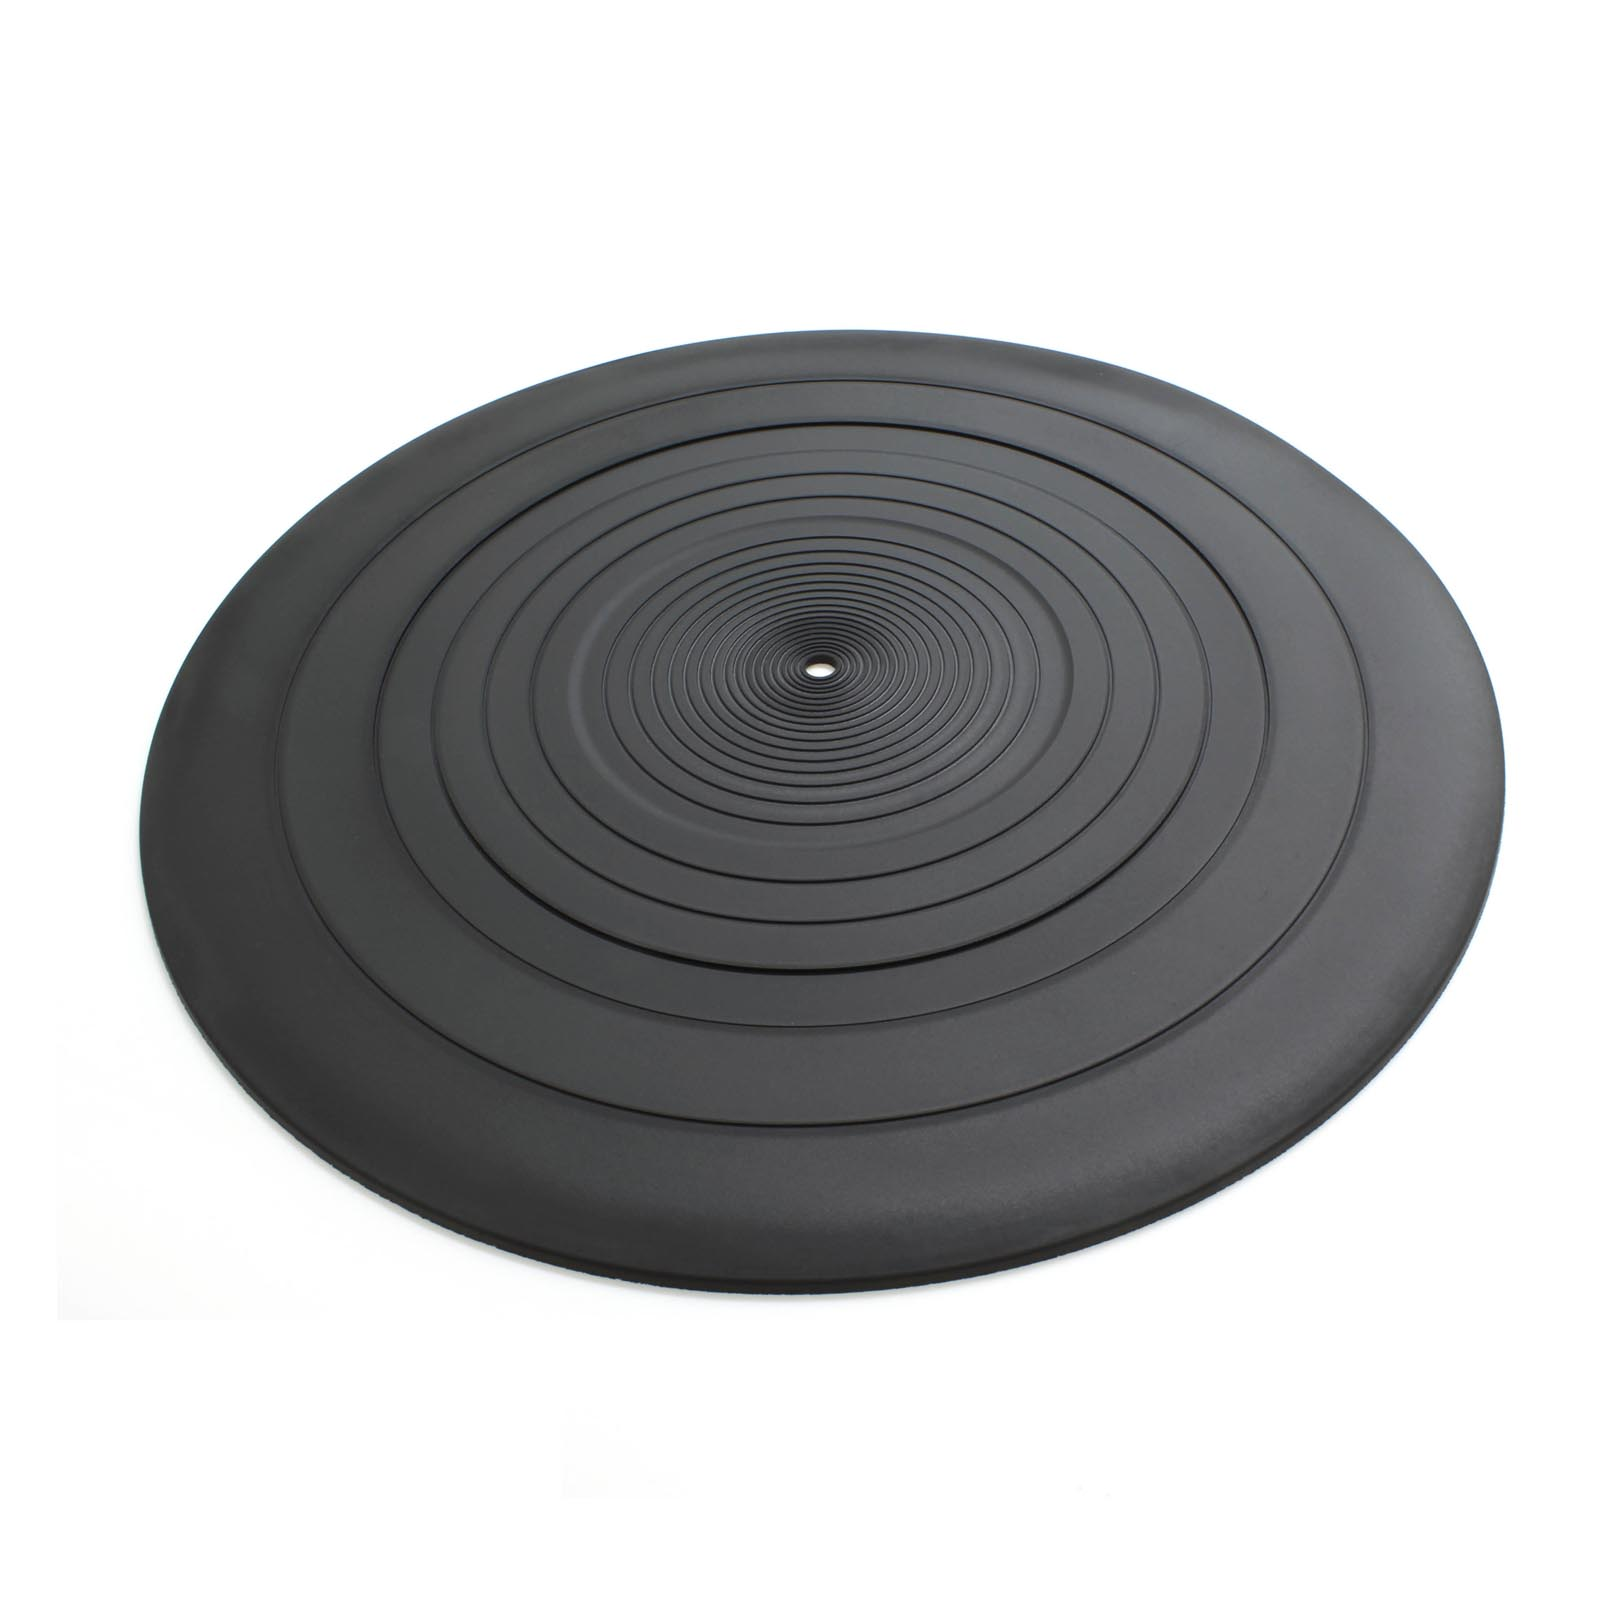 Genuine Technics Rgs0008 Turntable Rubber Mat For Sl 1200